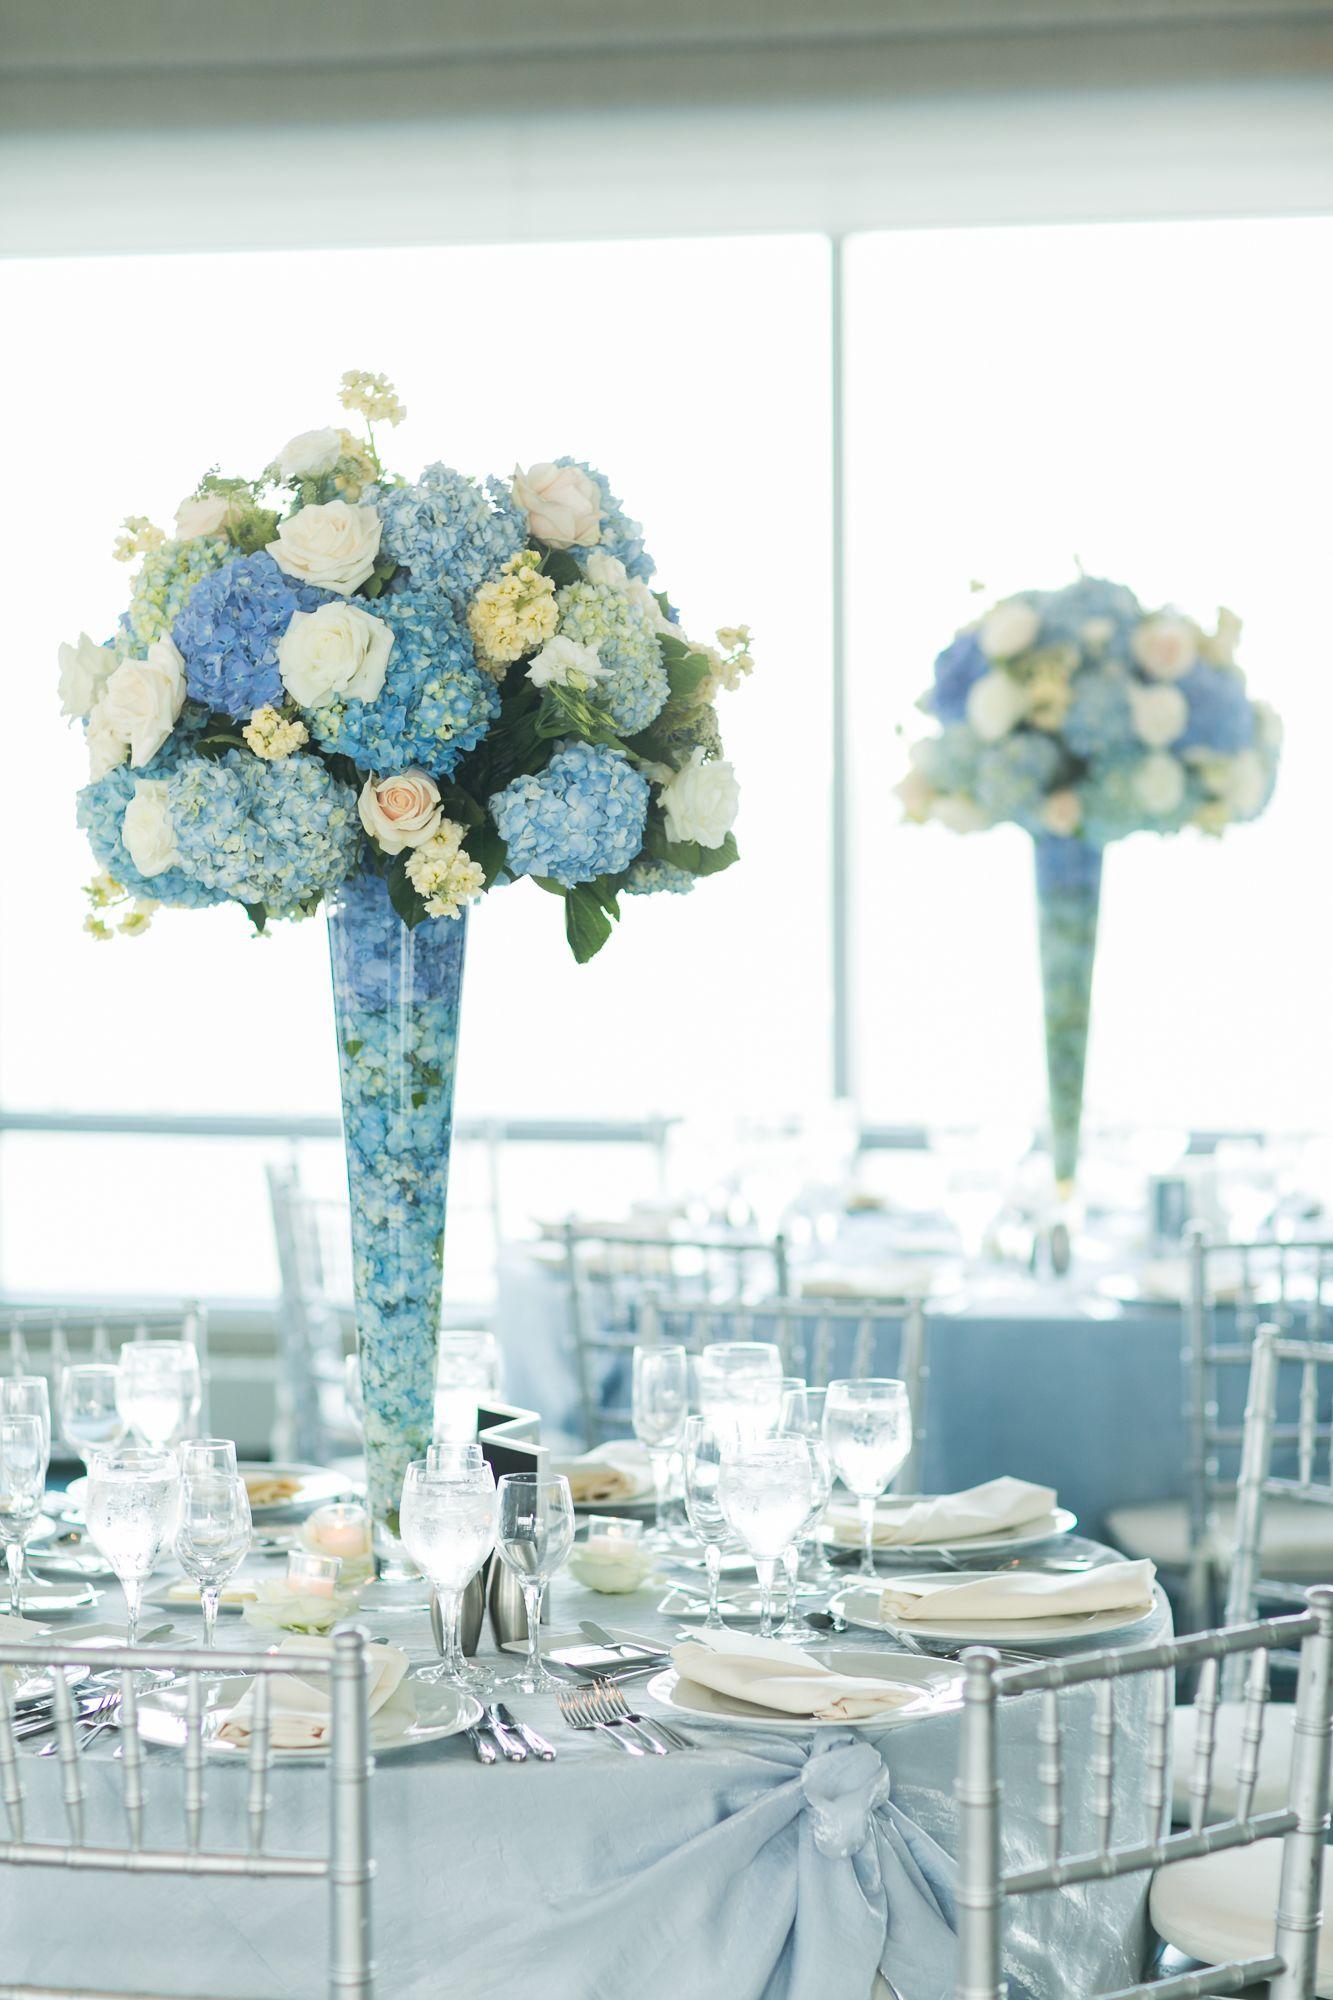 Light blue wedding decoration ideas  Blue Hydrangea and White Rose Centerpieces  Wedding flowers